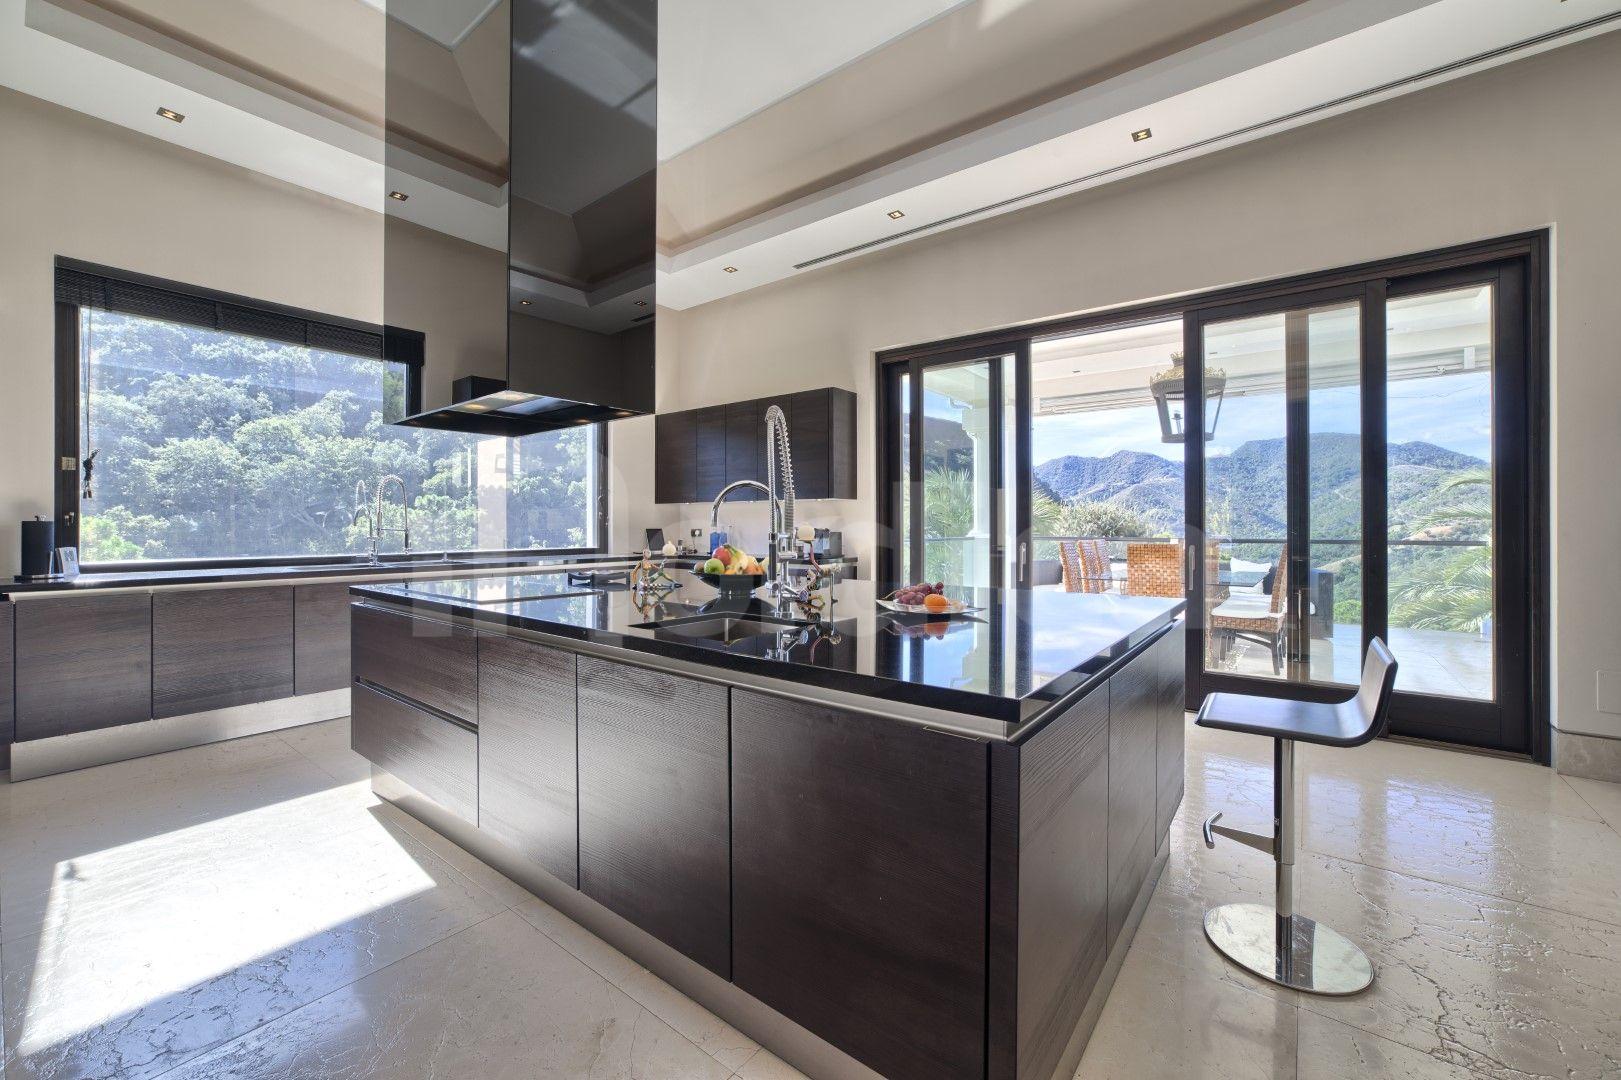 Penthouses for sale in La Zagaleta